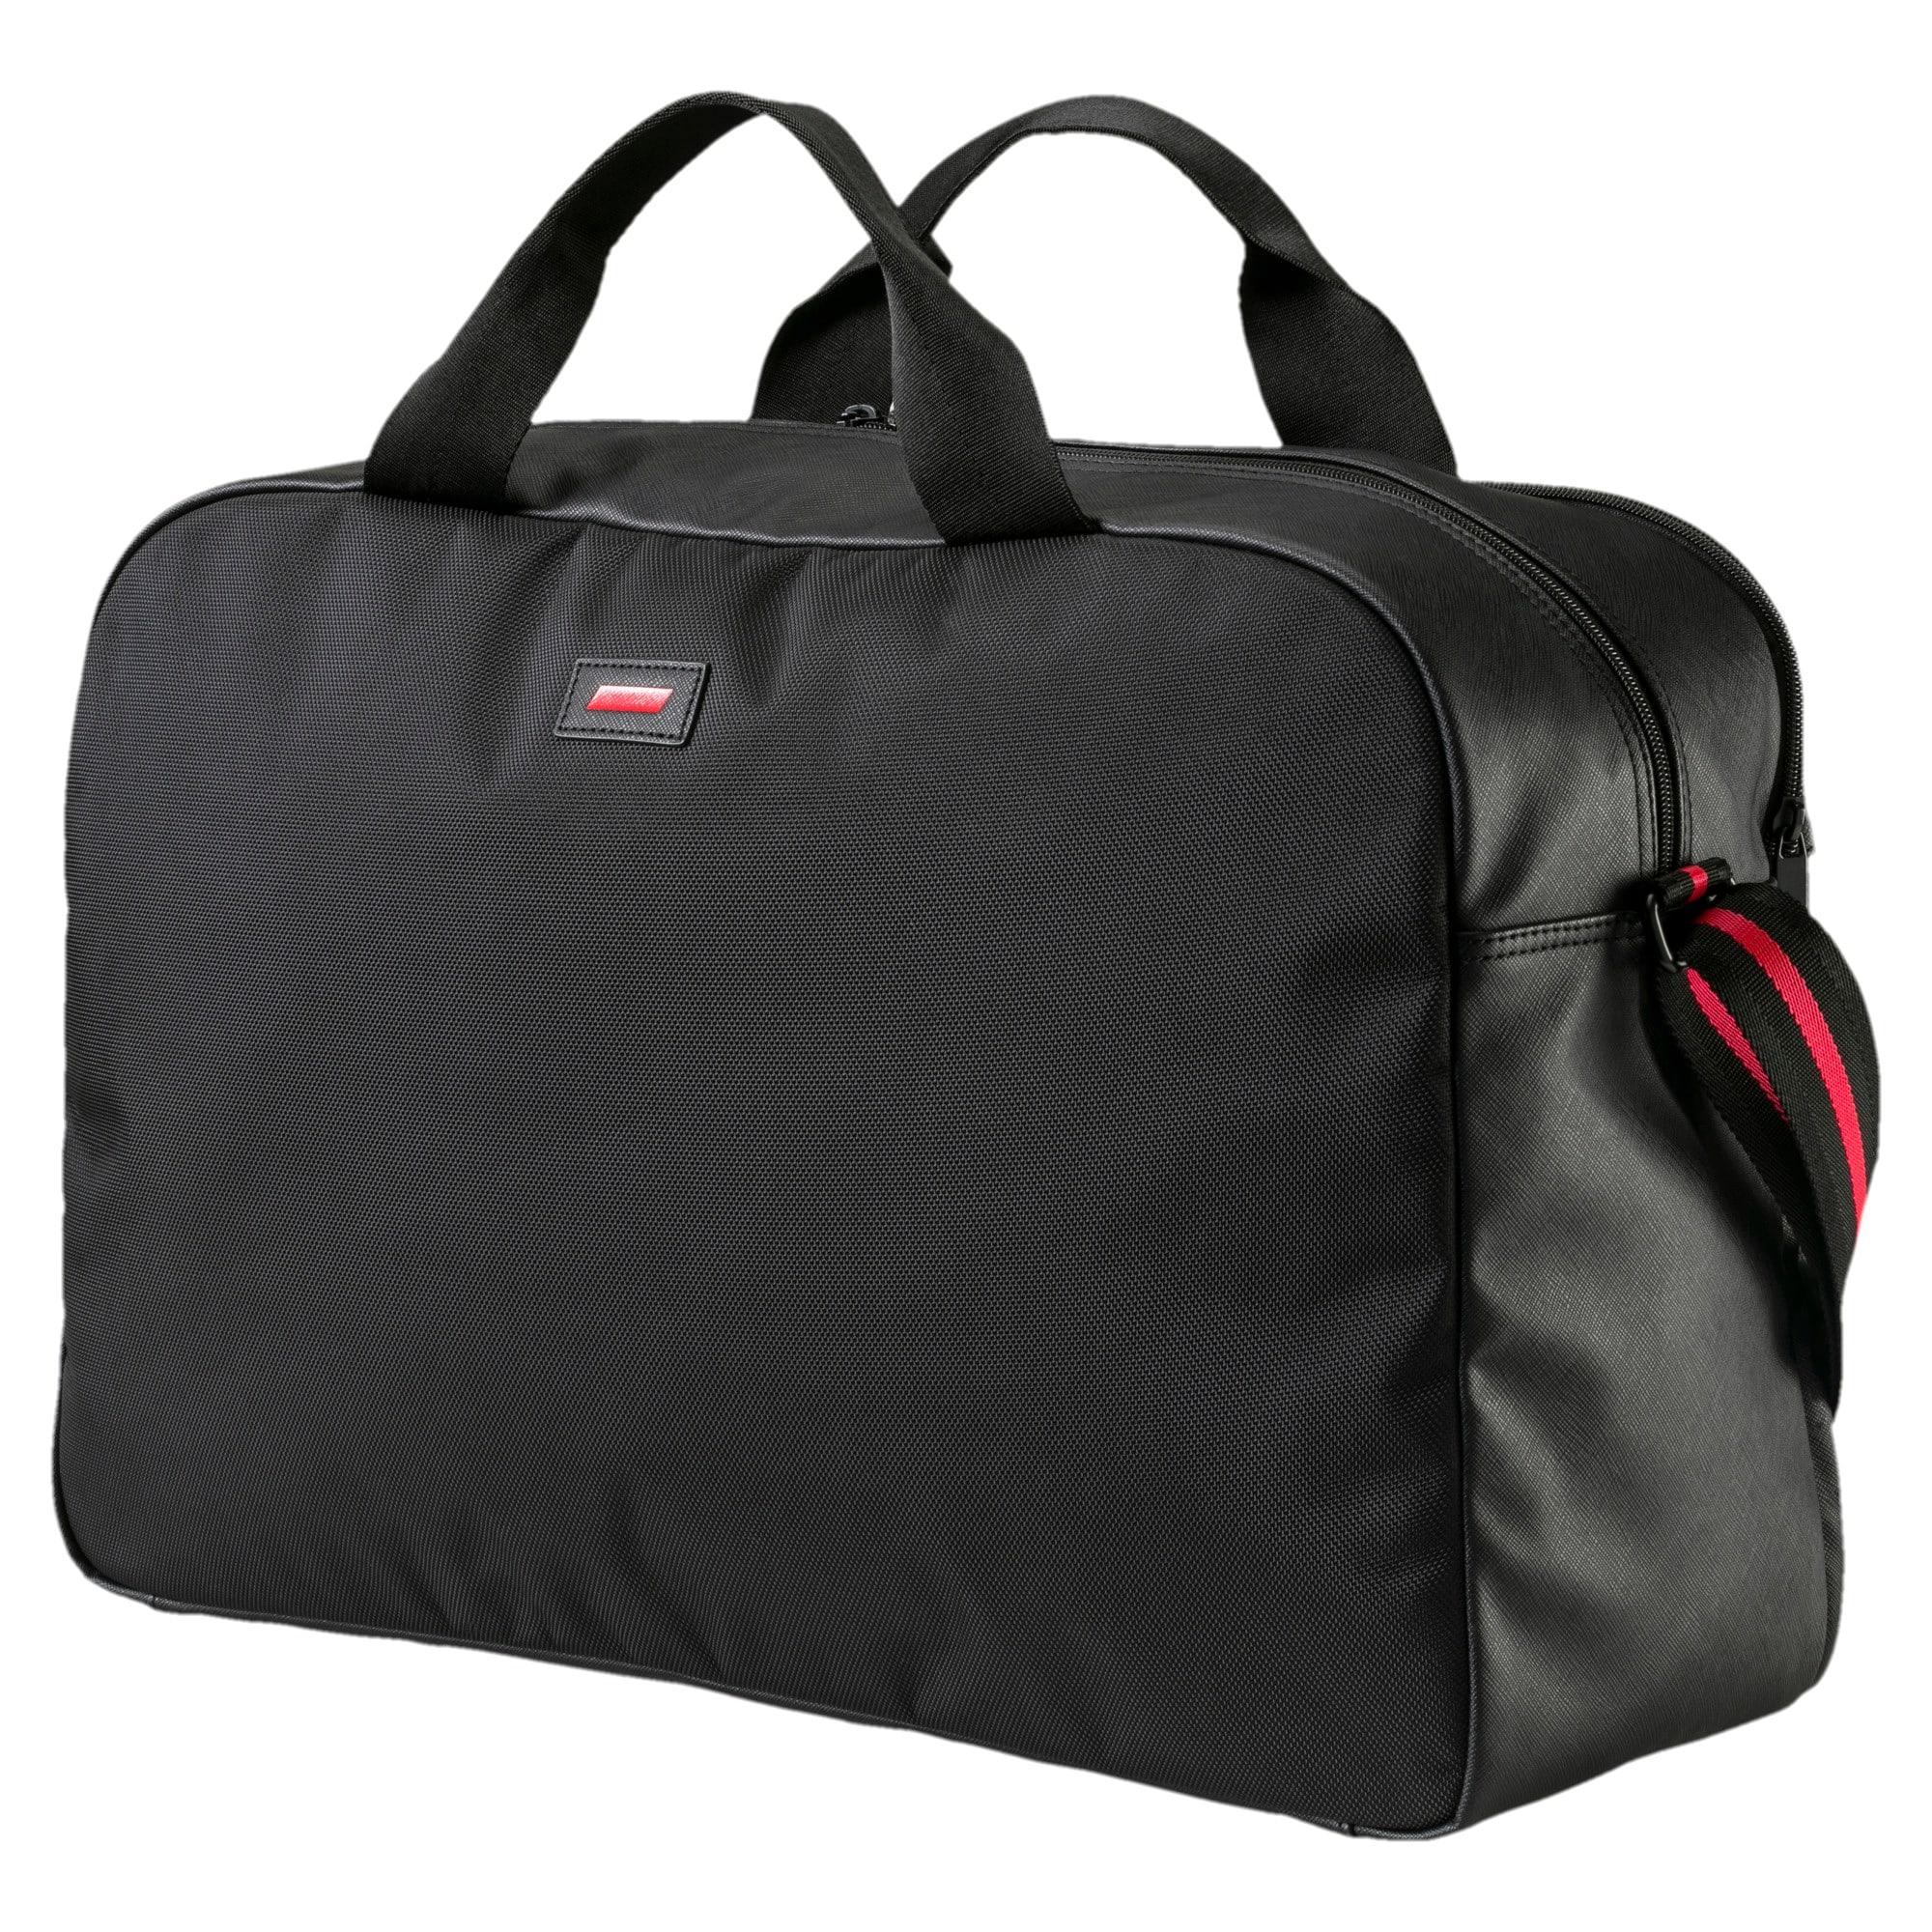 Thumbnail 2 of Ferrari Lifestyle Weekender Bag, Puma Black, medium-IND